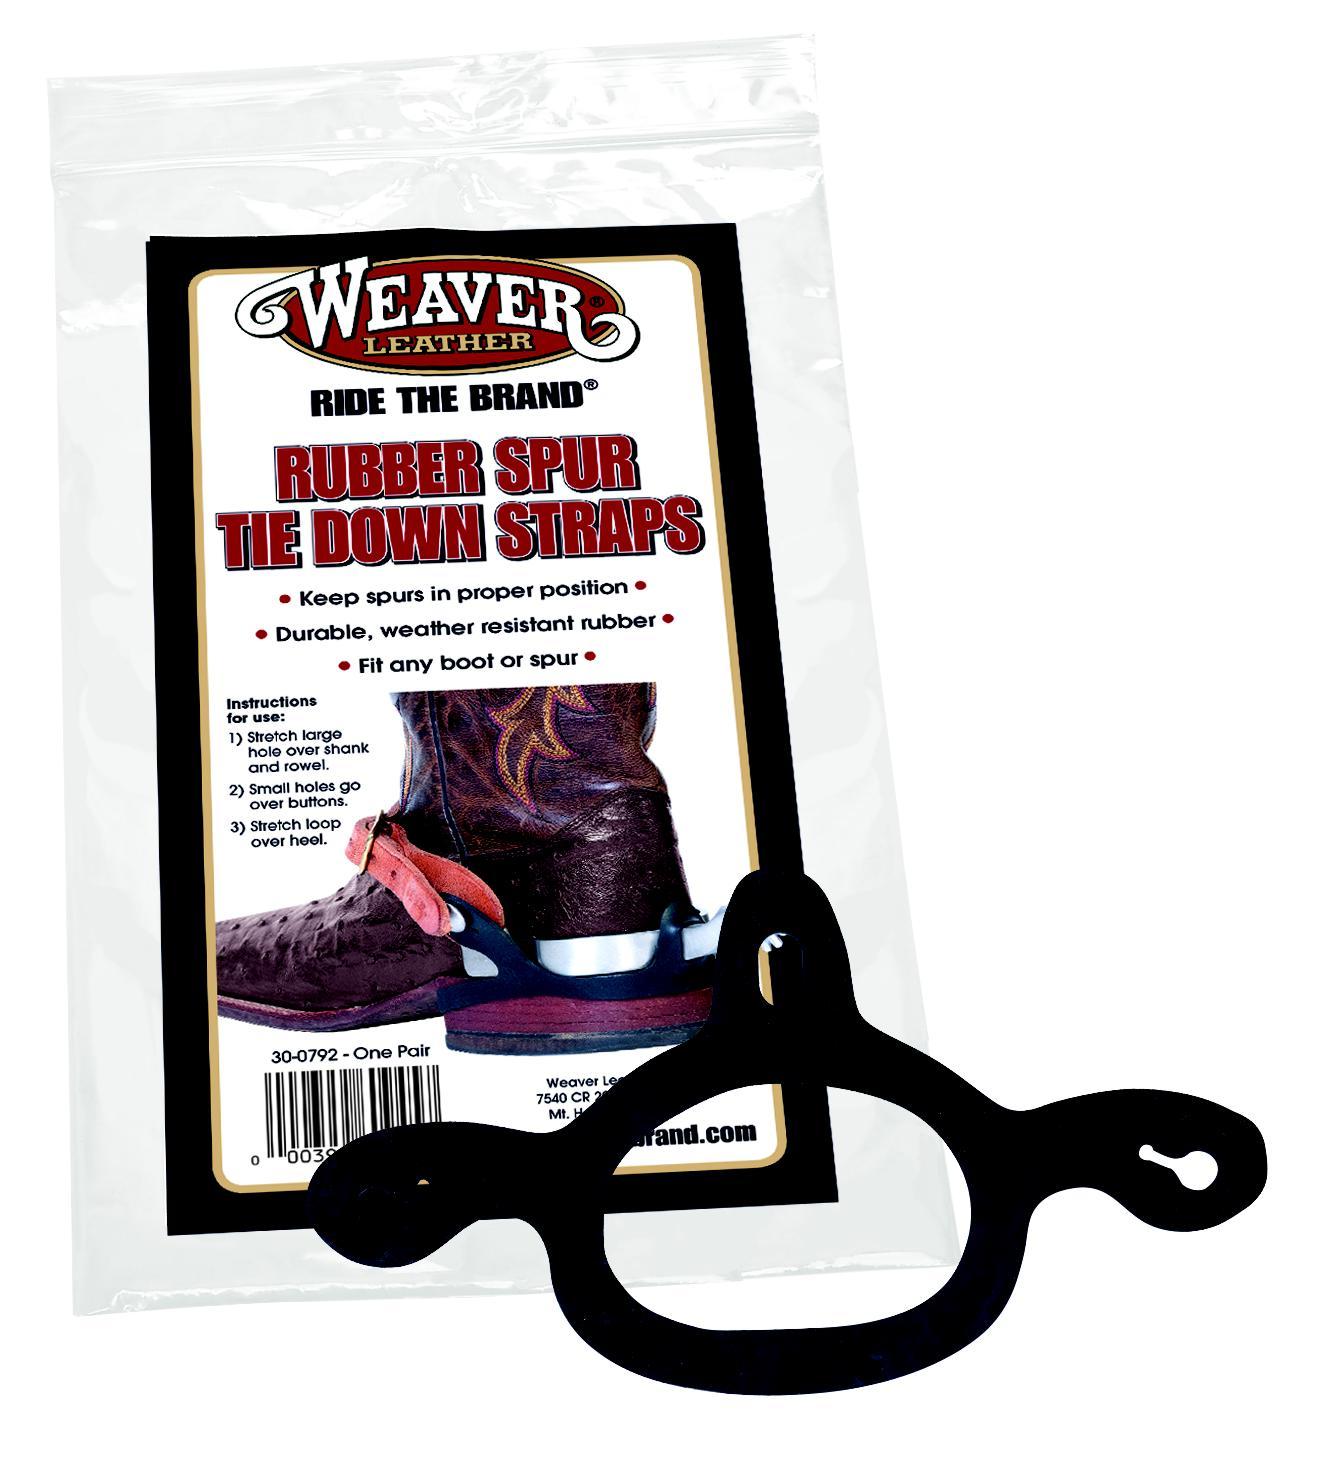 Weaver Rubber Spur Tie Down Straps